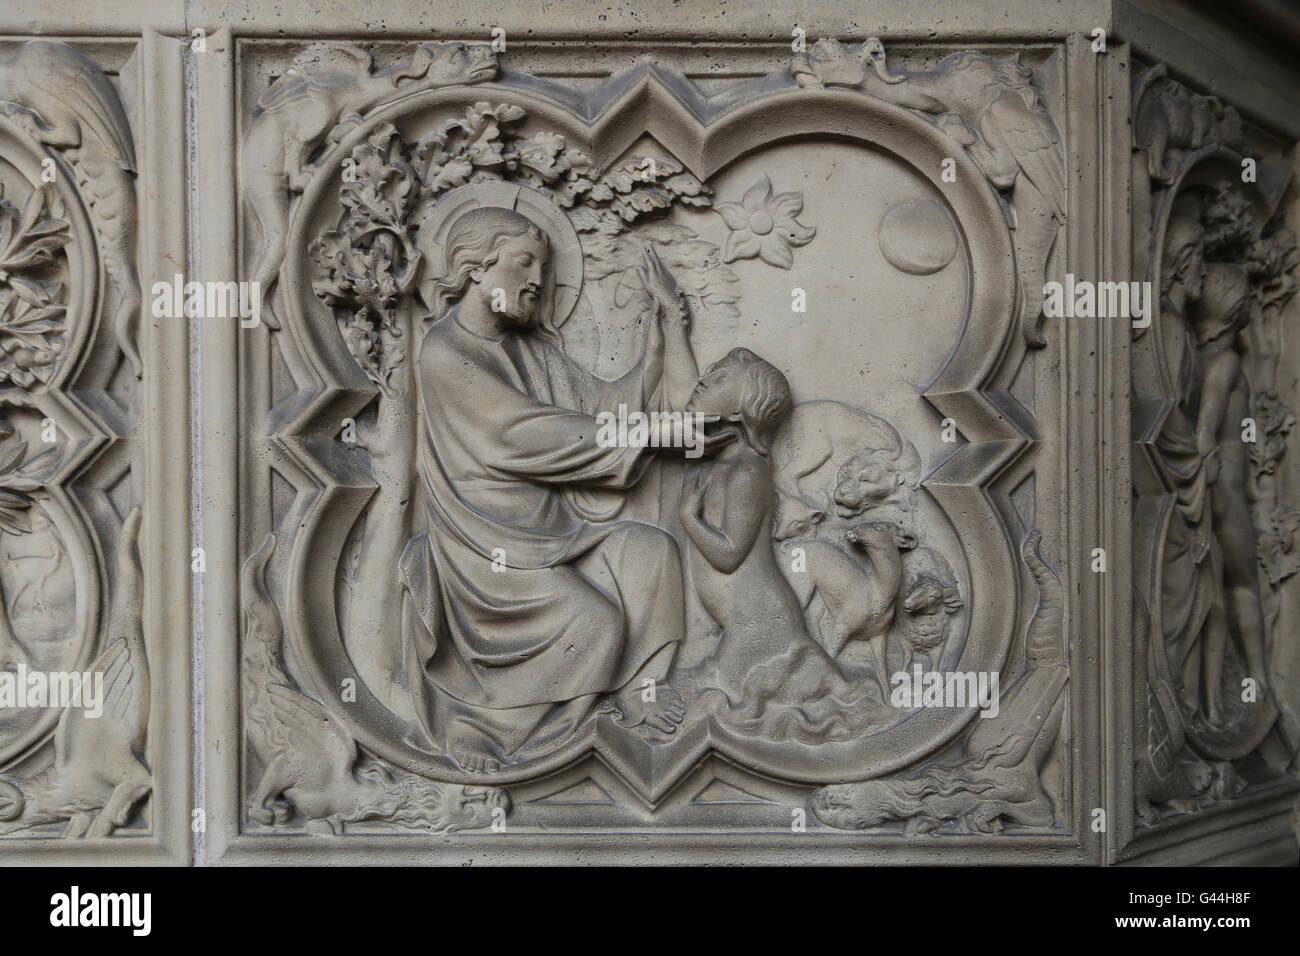 Creation of Adam. Relief. Genesis. 13th c. La Sainte-Chapelle, Paris, France. - Stock Image